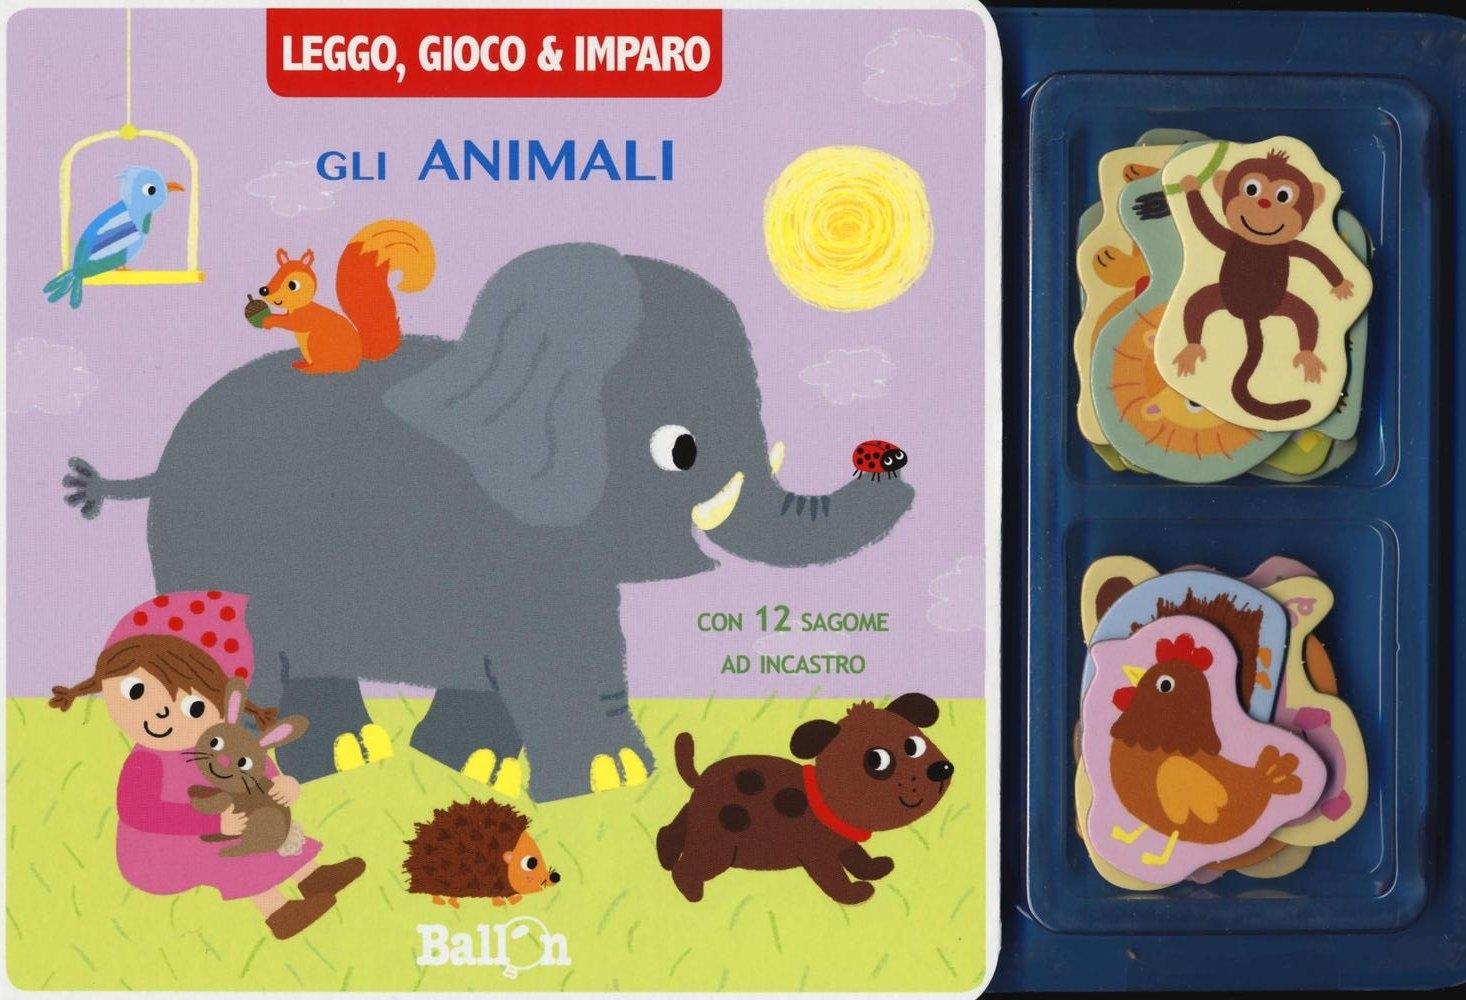 Gli animali. Leggo, gioco & imparo. Ediz. illustrata. Con gadget